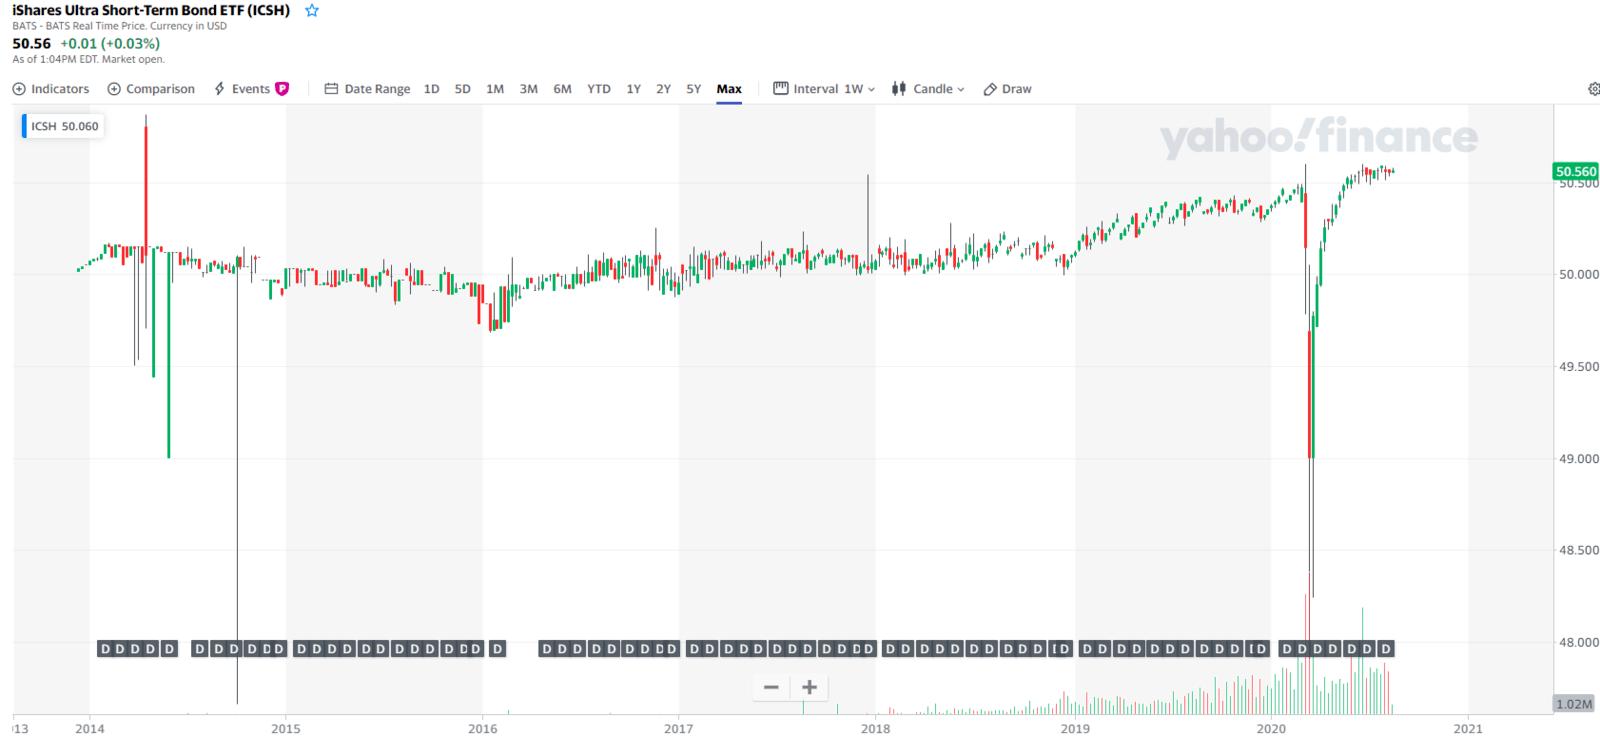 iShares Ultra Short-Term Bond ETF (ICSH)